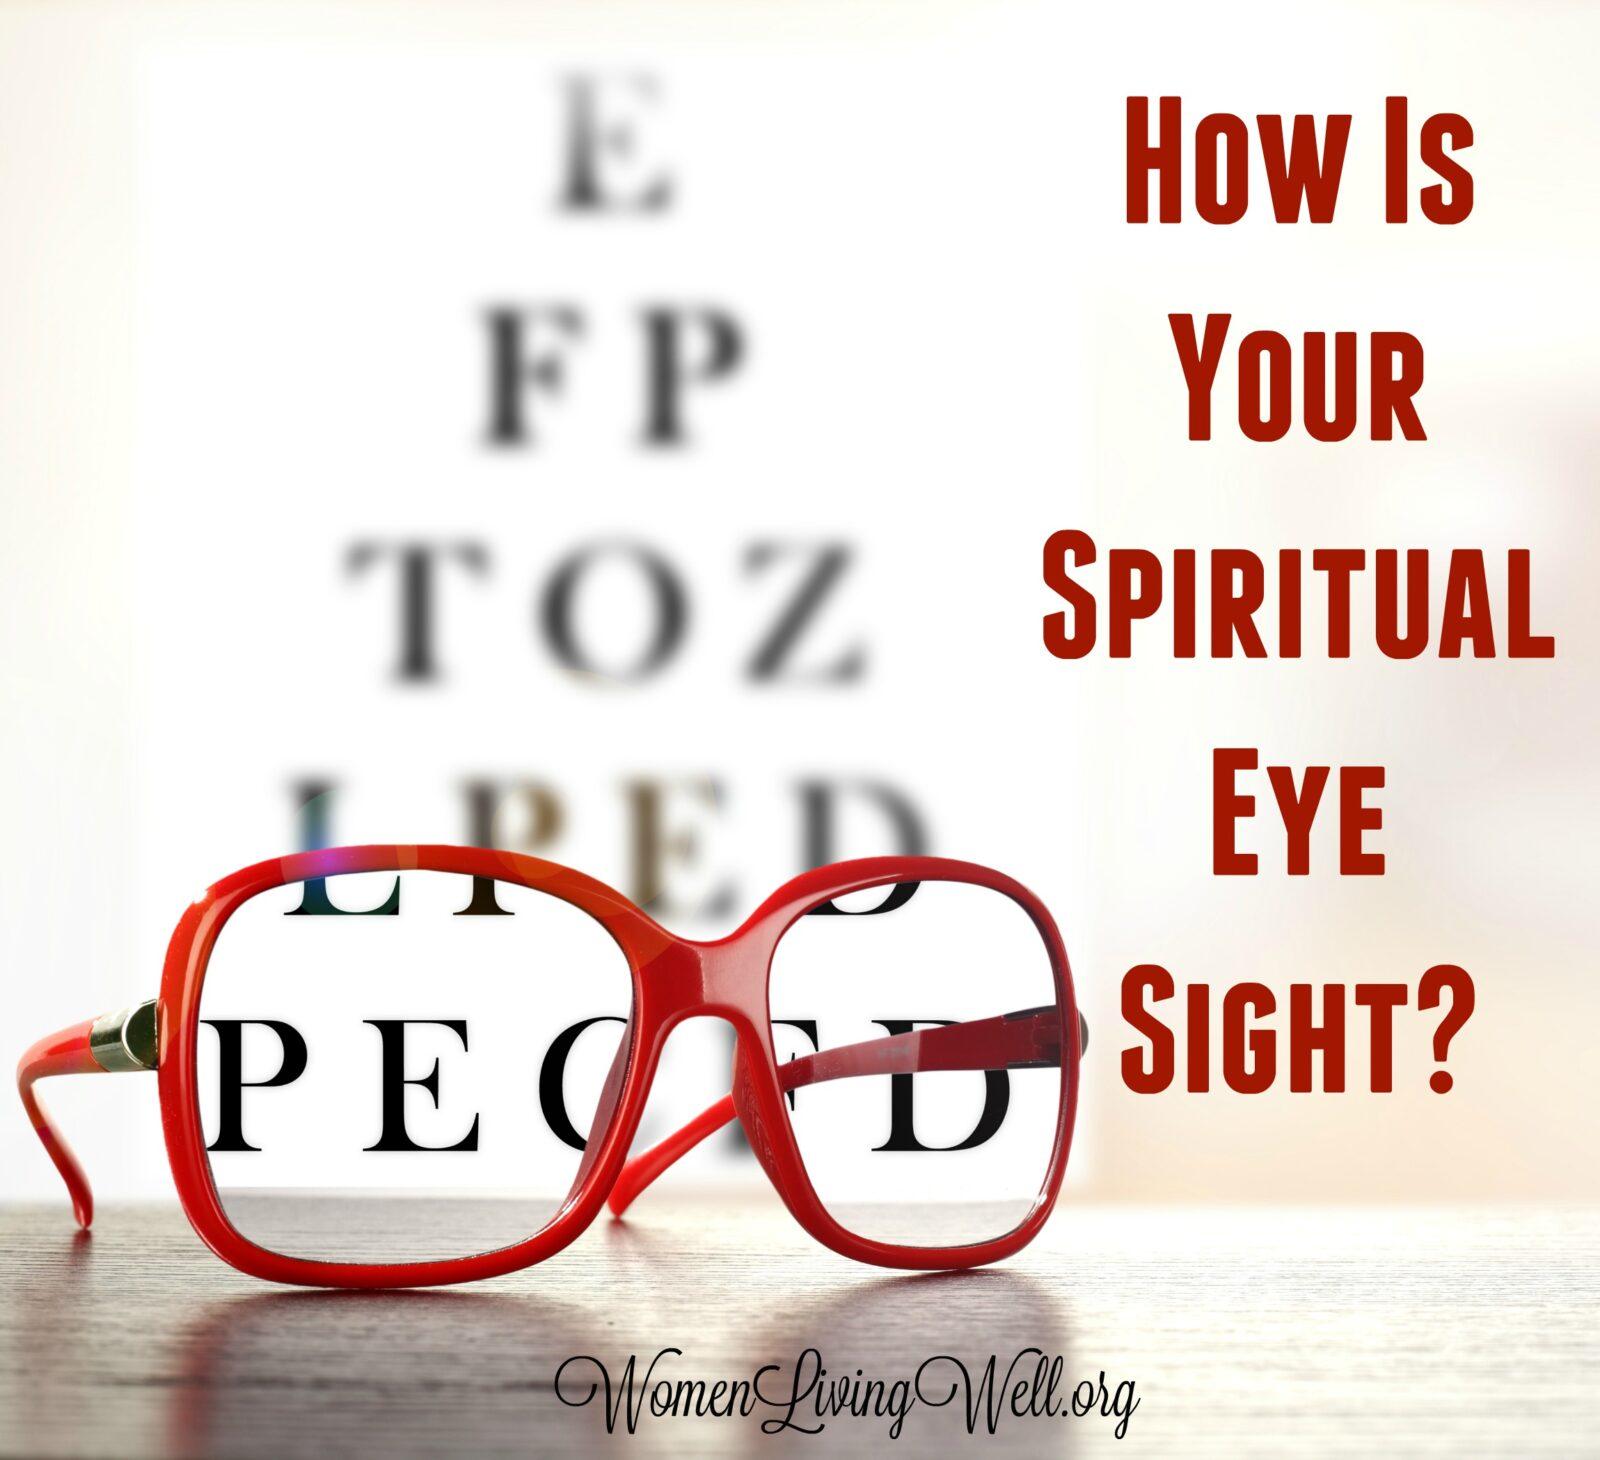 How is your spiritual eye sight women living well how is your spiritual eye sight nvjuhfo Images